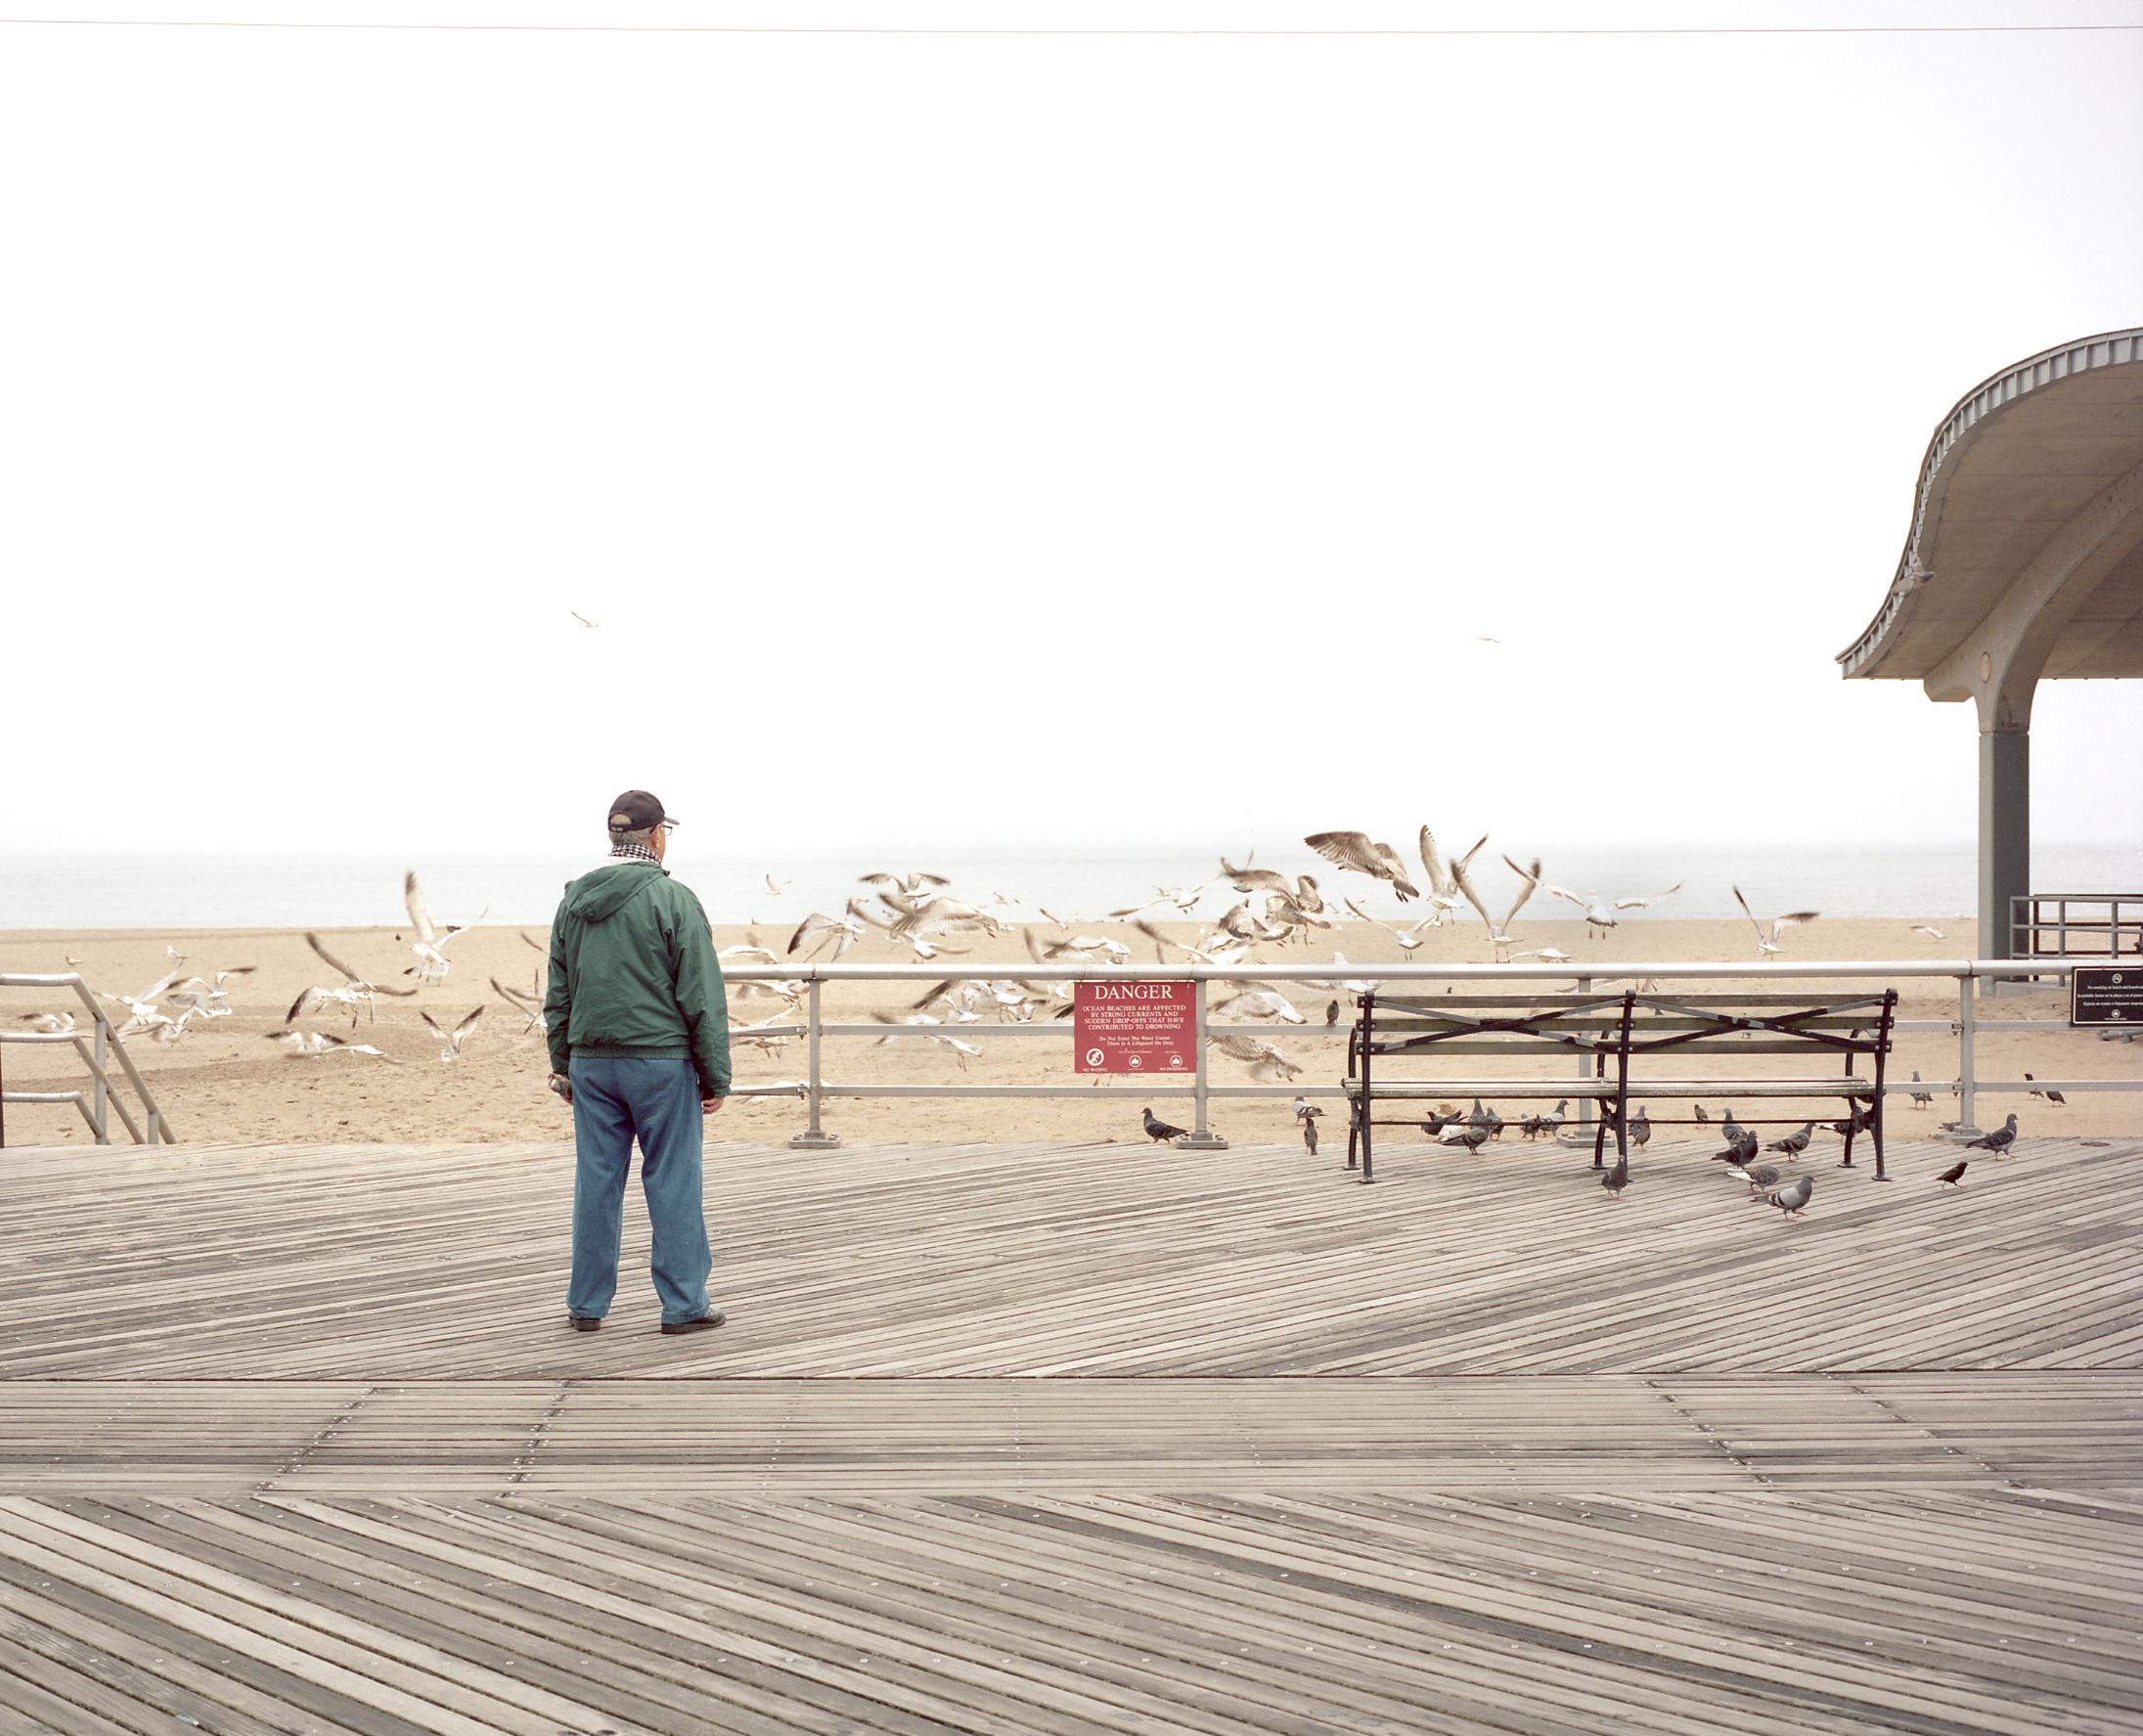 Bordwalk1.jpg